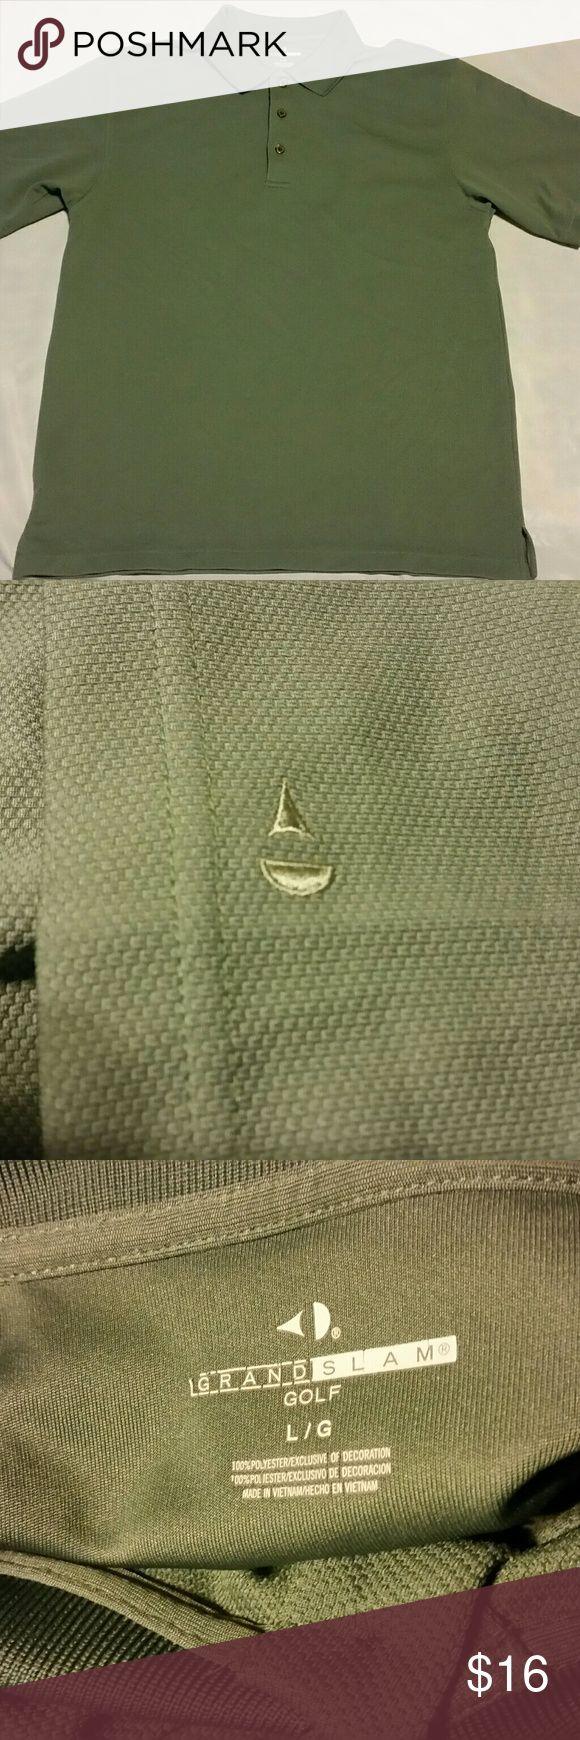 "Grand Slam Golf Polo style shirt Short Sleeved  Green golf skirt.  19"" across shoulders.  27"" topsail length.  17"" length under arm to hem.  21"" across chest.  Knit collar. grand slam  Shirts Polos"